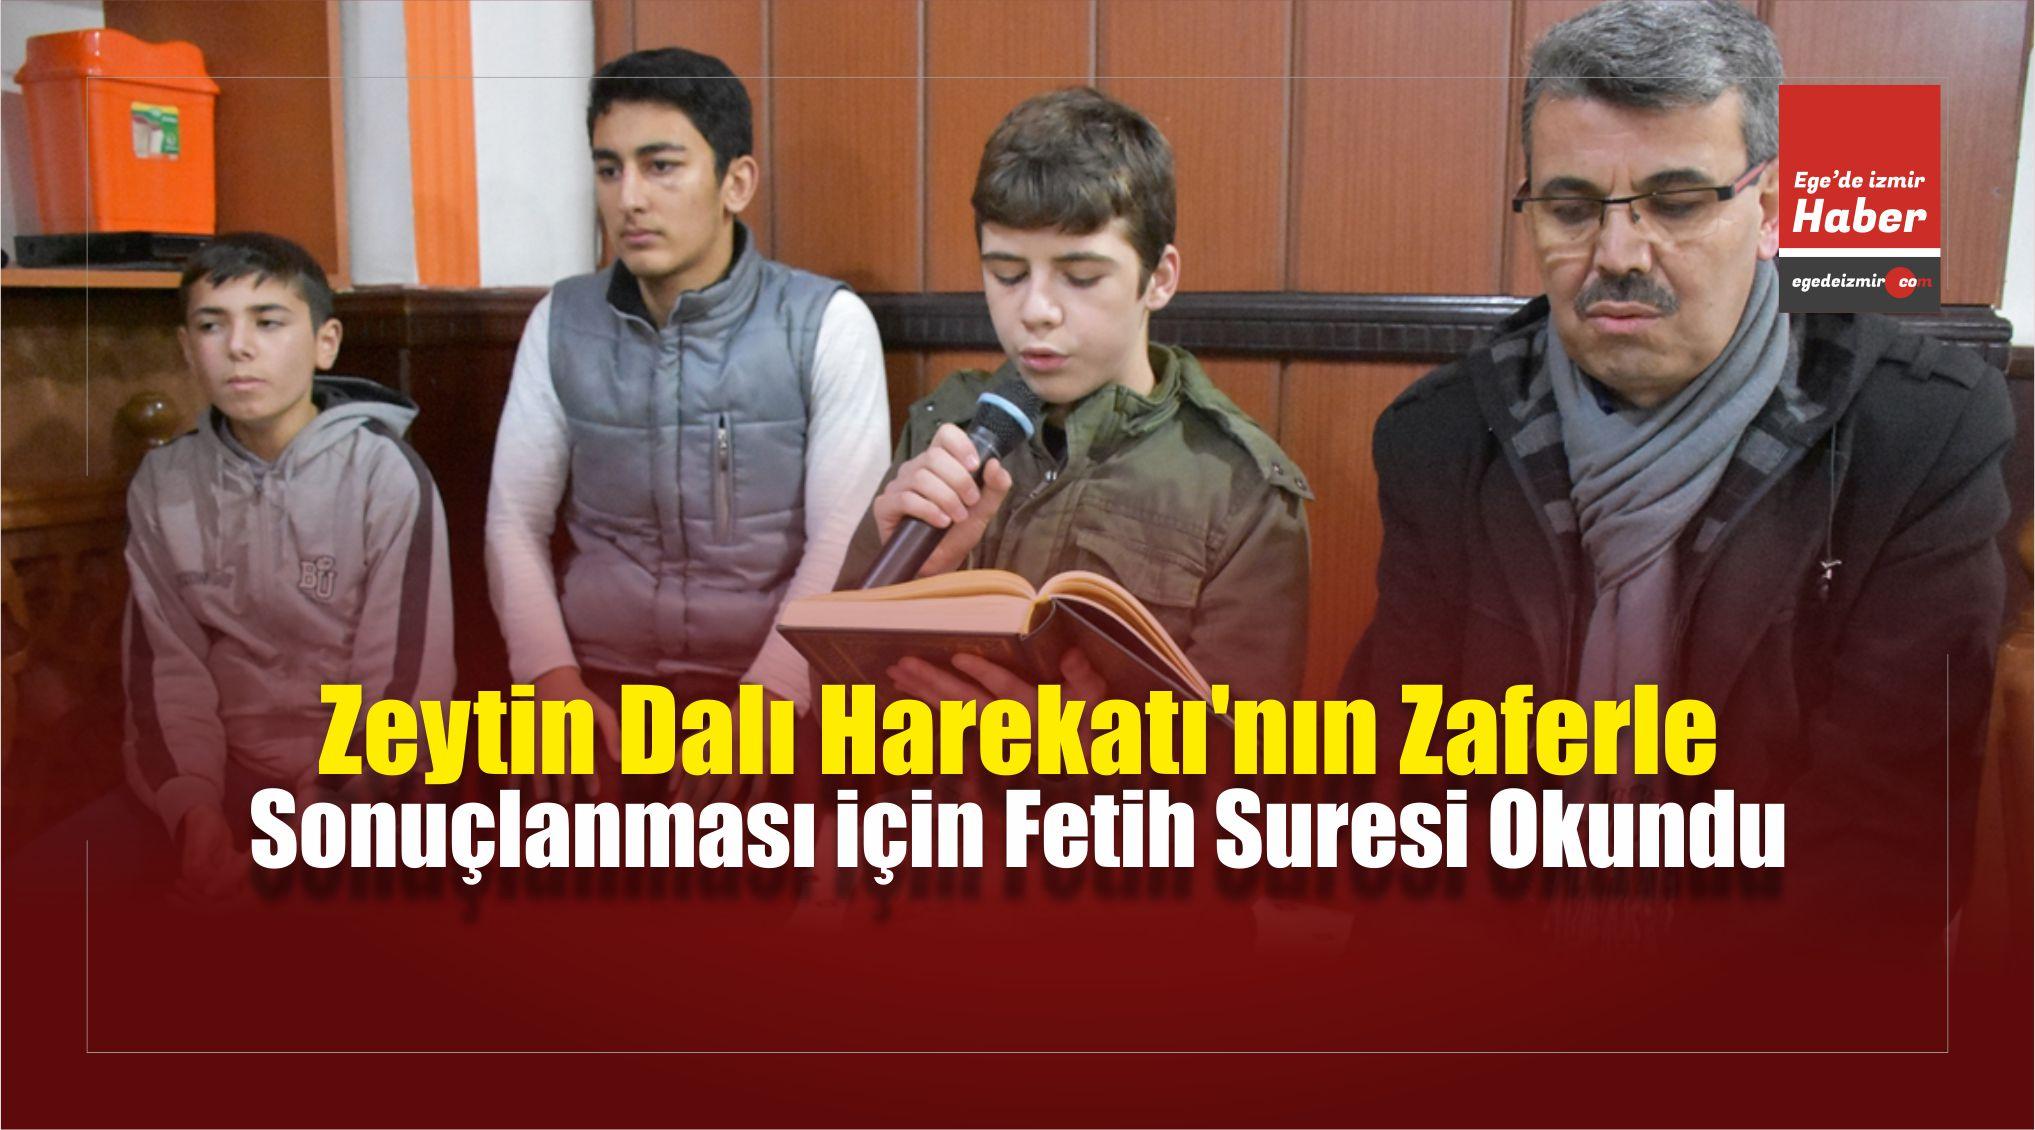 Afrin U0026 39 Deki Zeytin Dal U0131 Harekat U0131 U0026 39 N U0131n Zaferle Sonu U00e7lanmas U0131